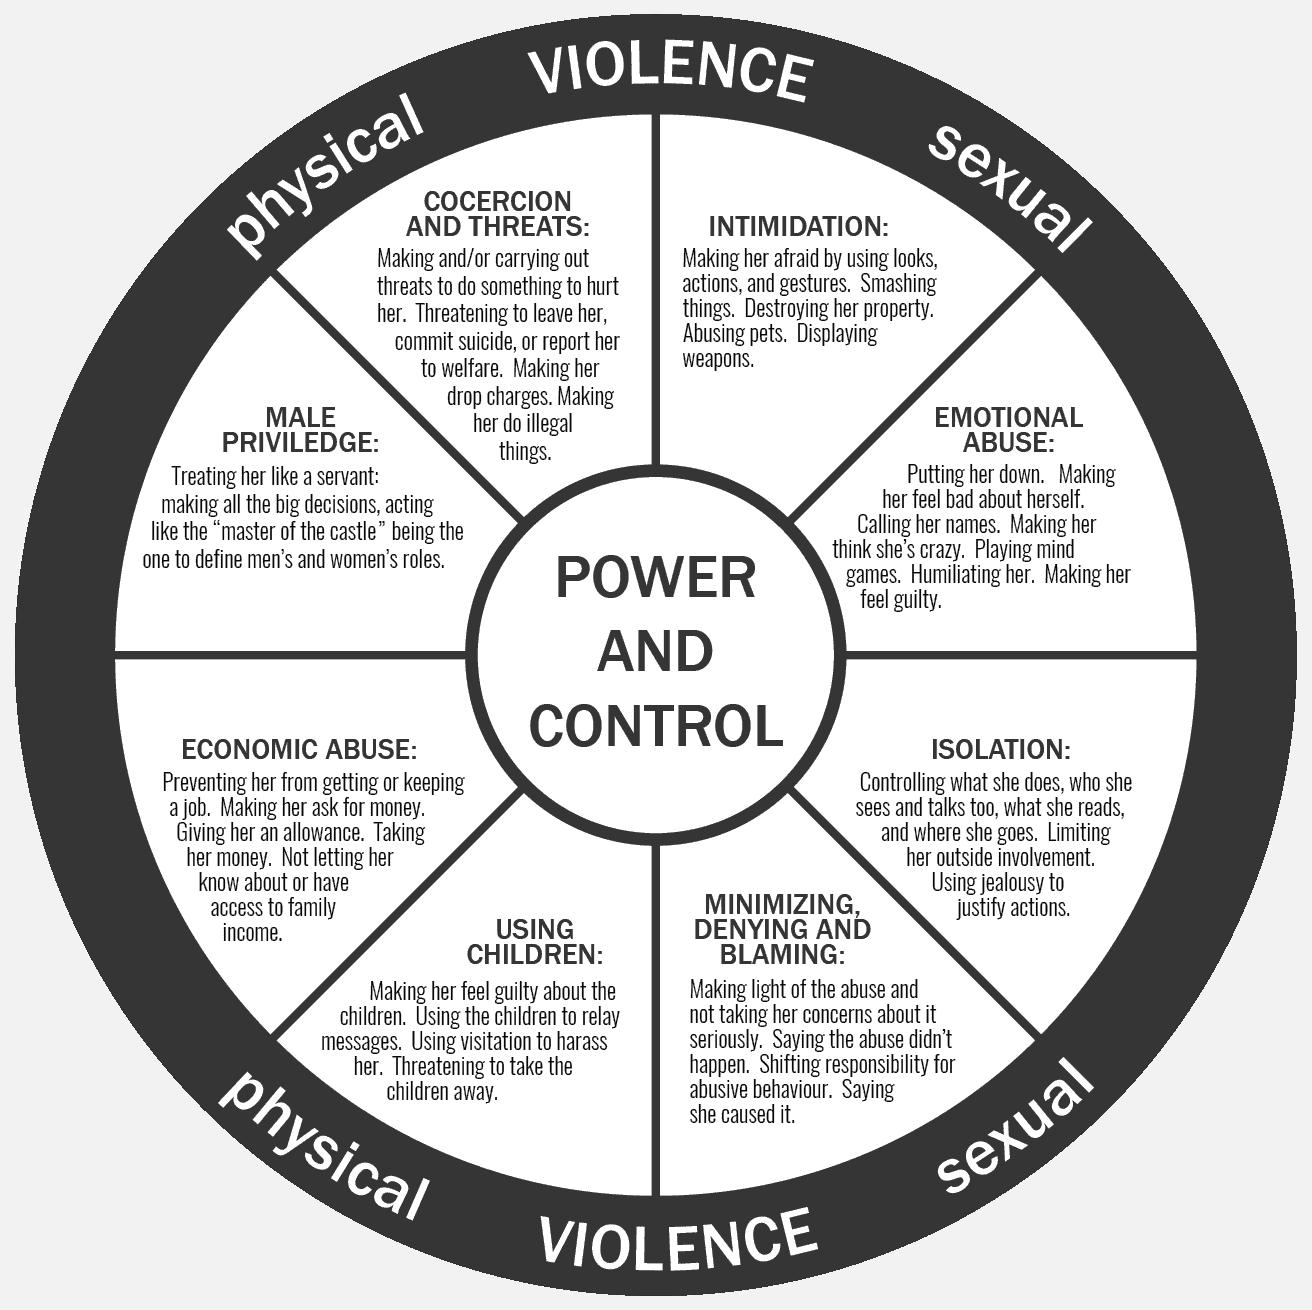 Isaac Region Domestic Violence Information